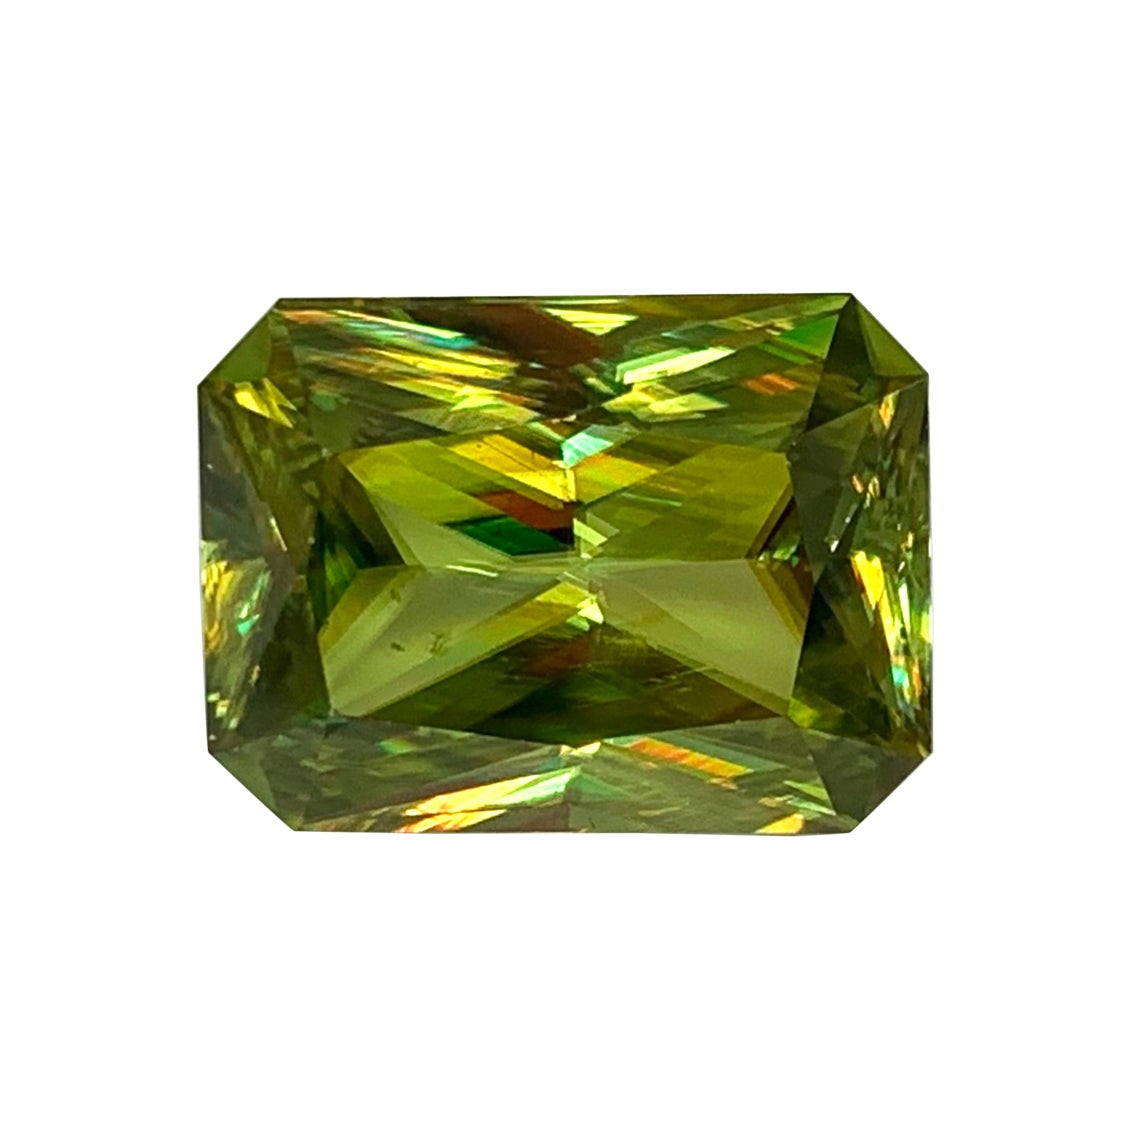 14.43 Carat Sphene Octagonal Cut, Unset Rare Loose Pendant Collector Gemstone